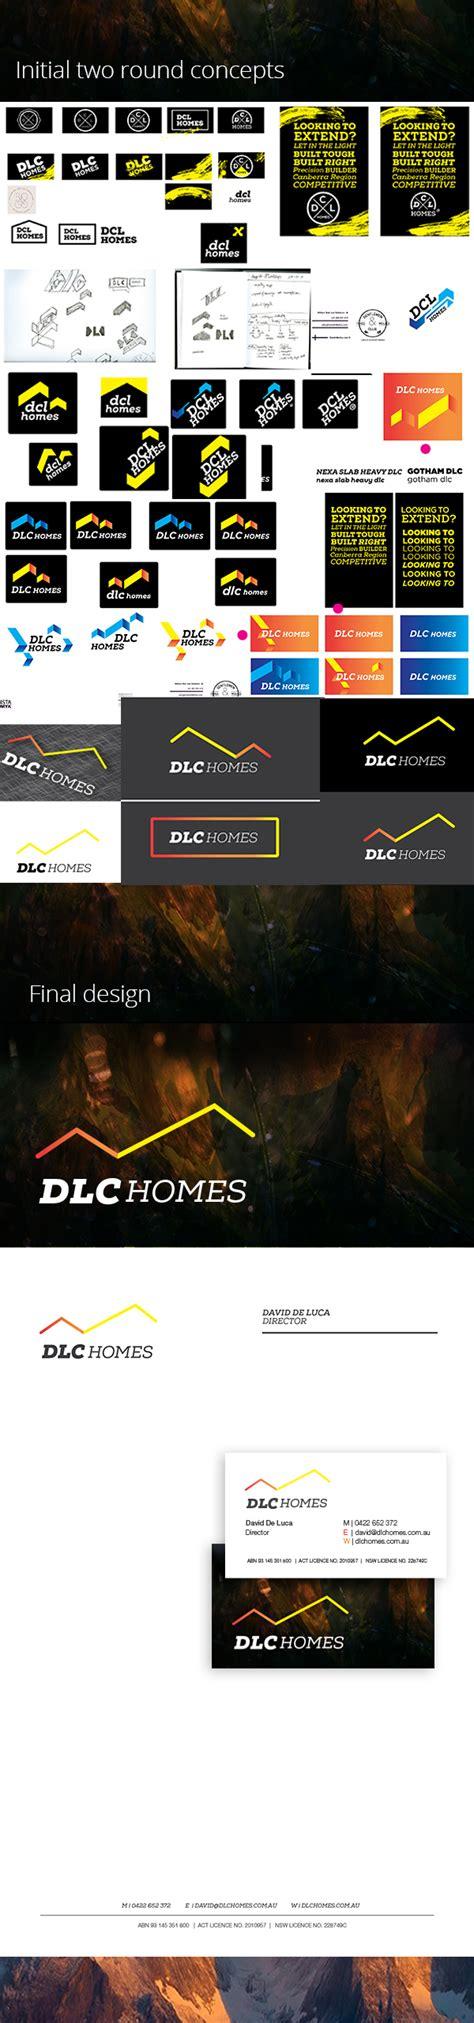 Hcd 101 Digital Ux Design dlc homes sendinthefox mobile experience designer